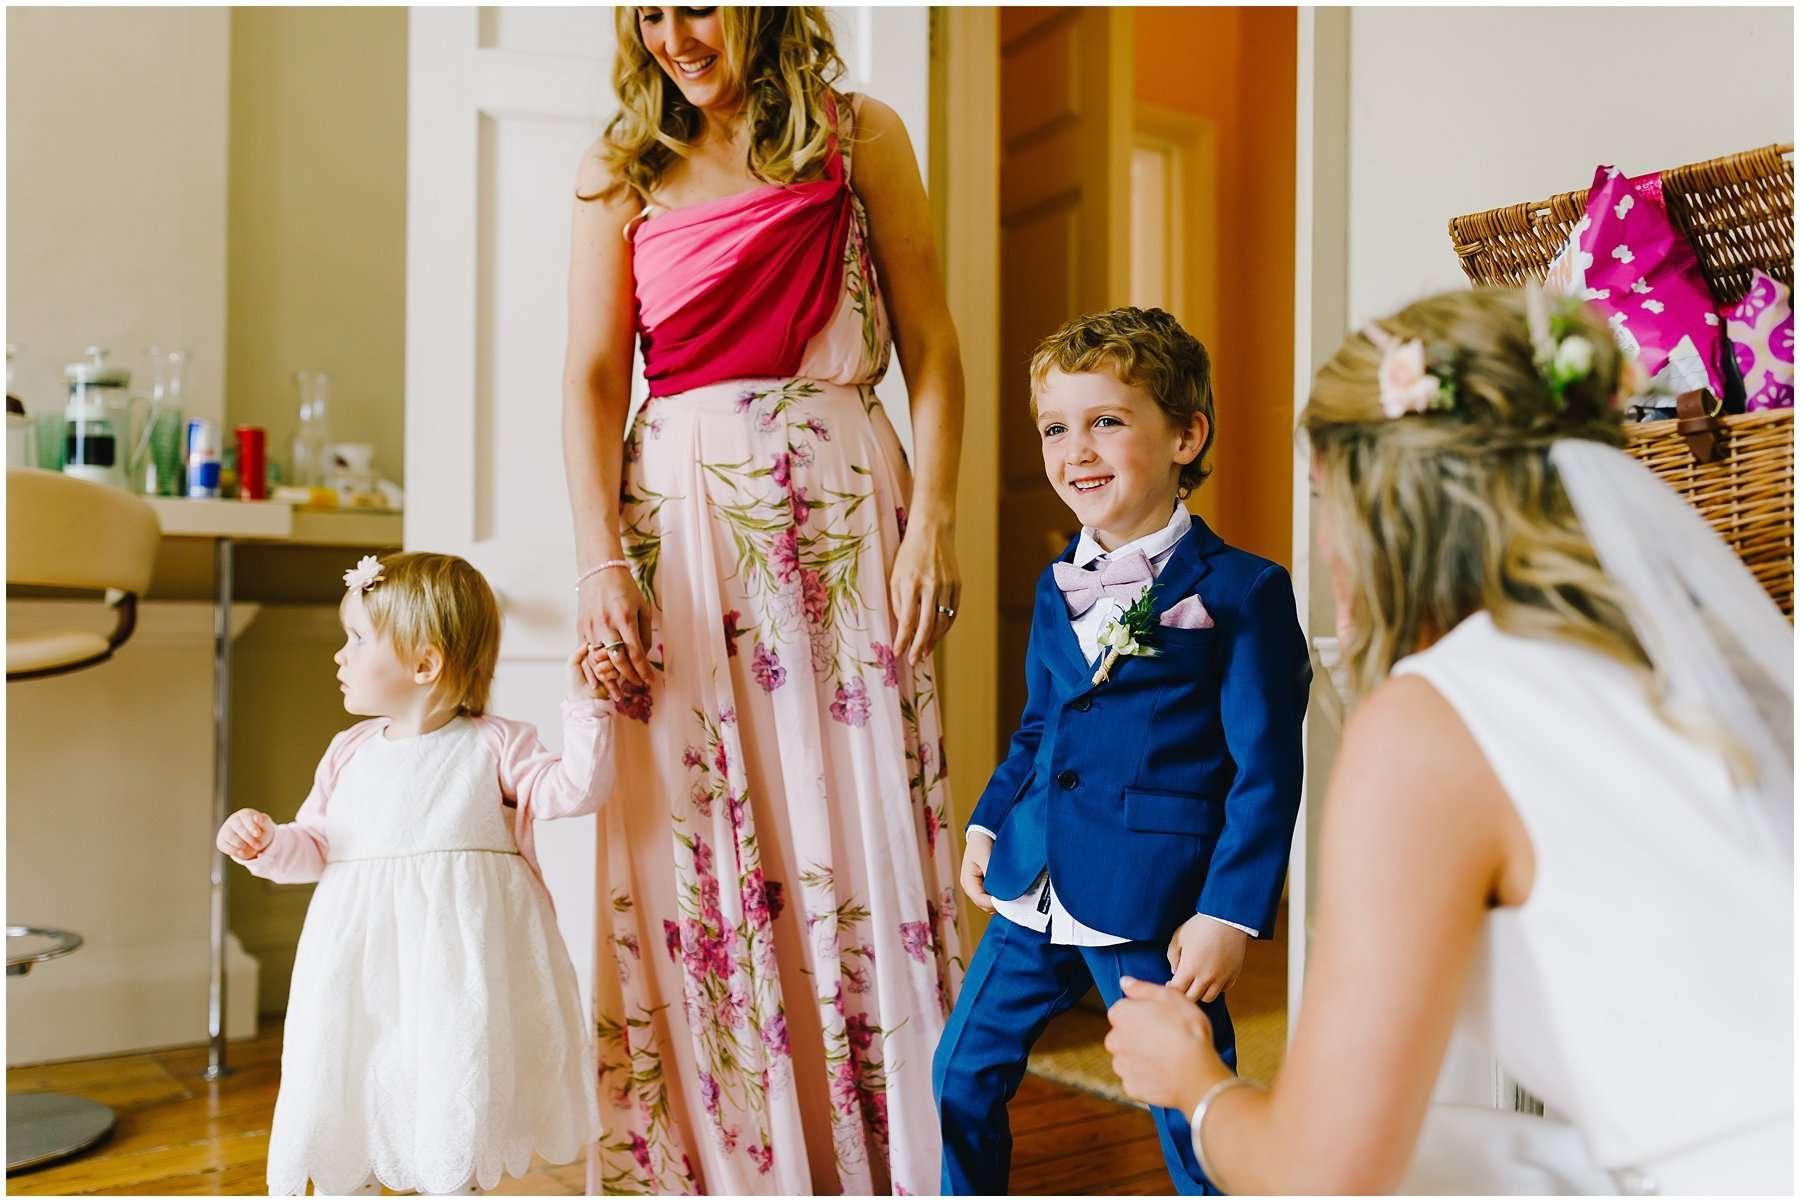 REBEKAH AND PAUL NARBOROUGH HALL WEDDING - NORFOLK WEDDING PHOTOGRAPHER